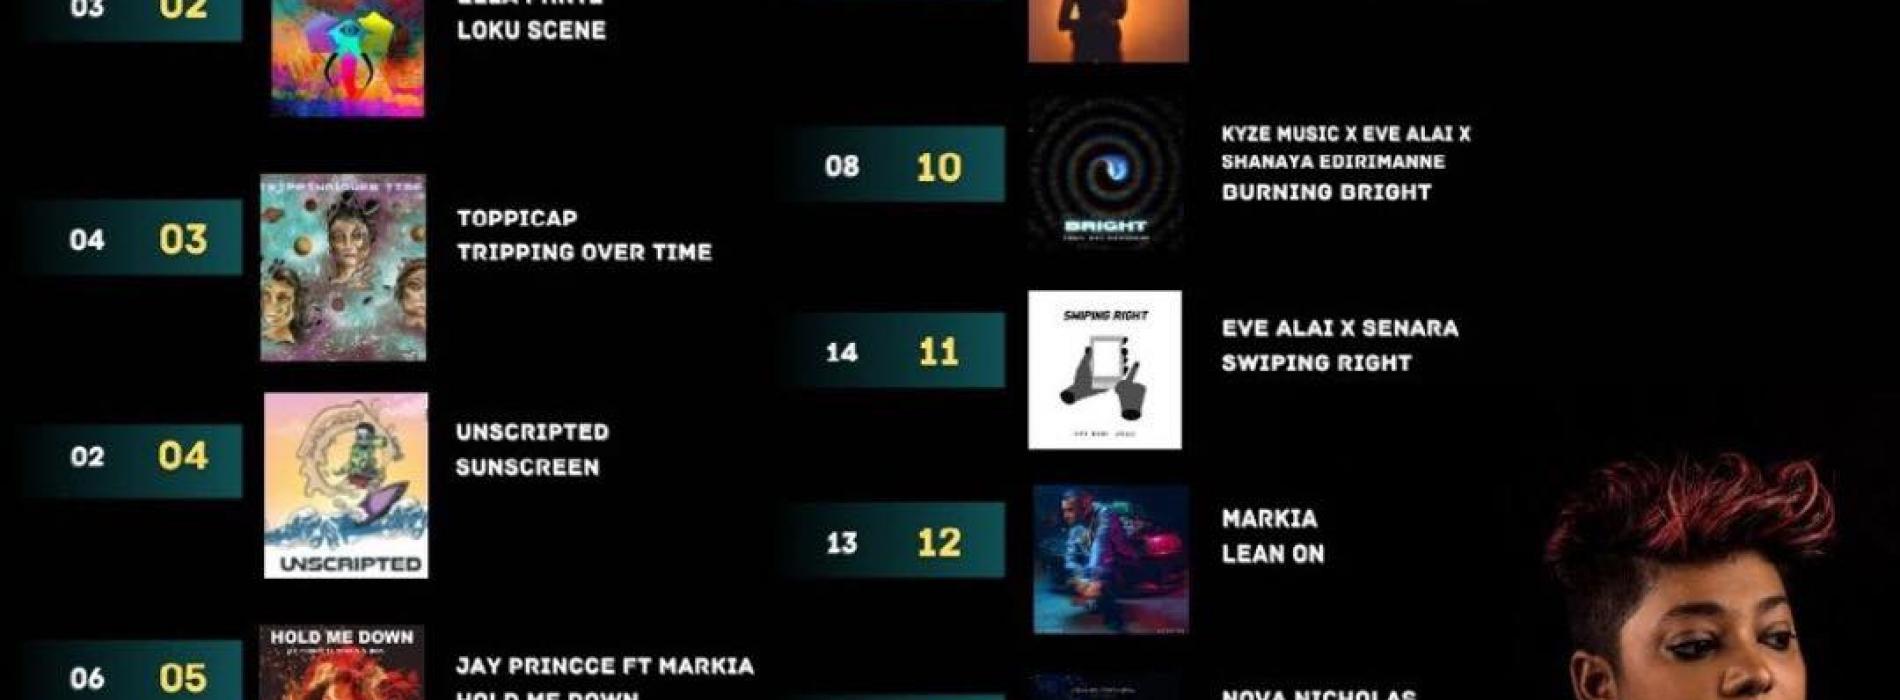 News : Its Week 9 For Eve Alai, Madaid & Arjun Ratwatta At Number 1!